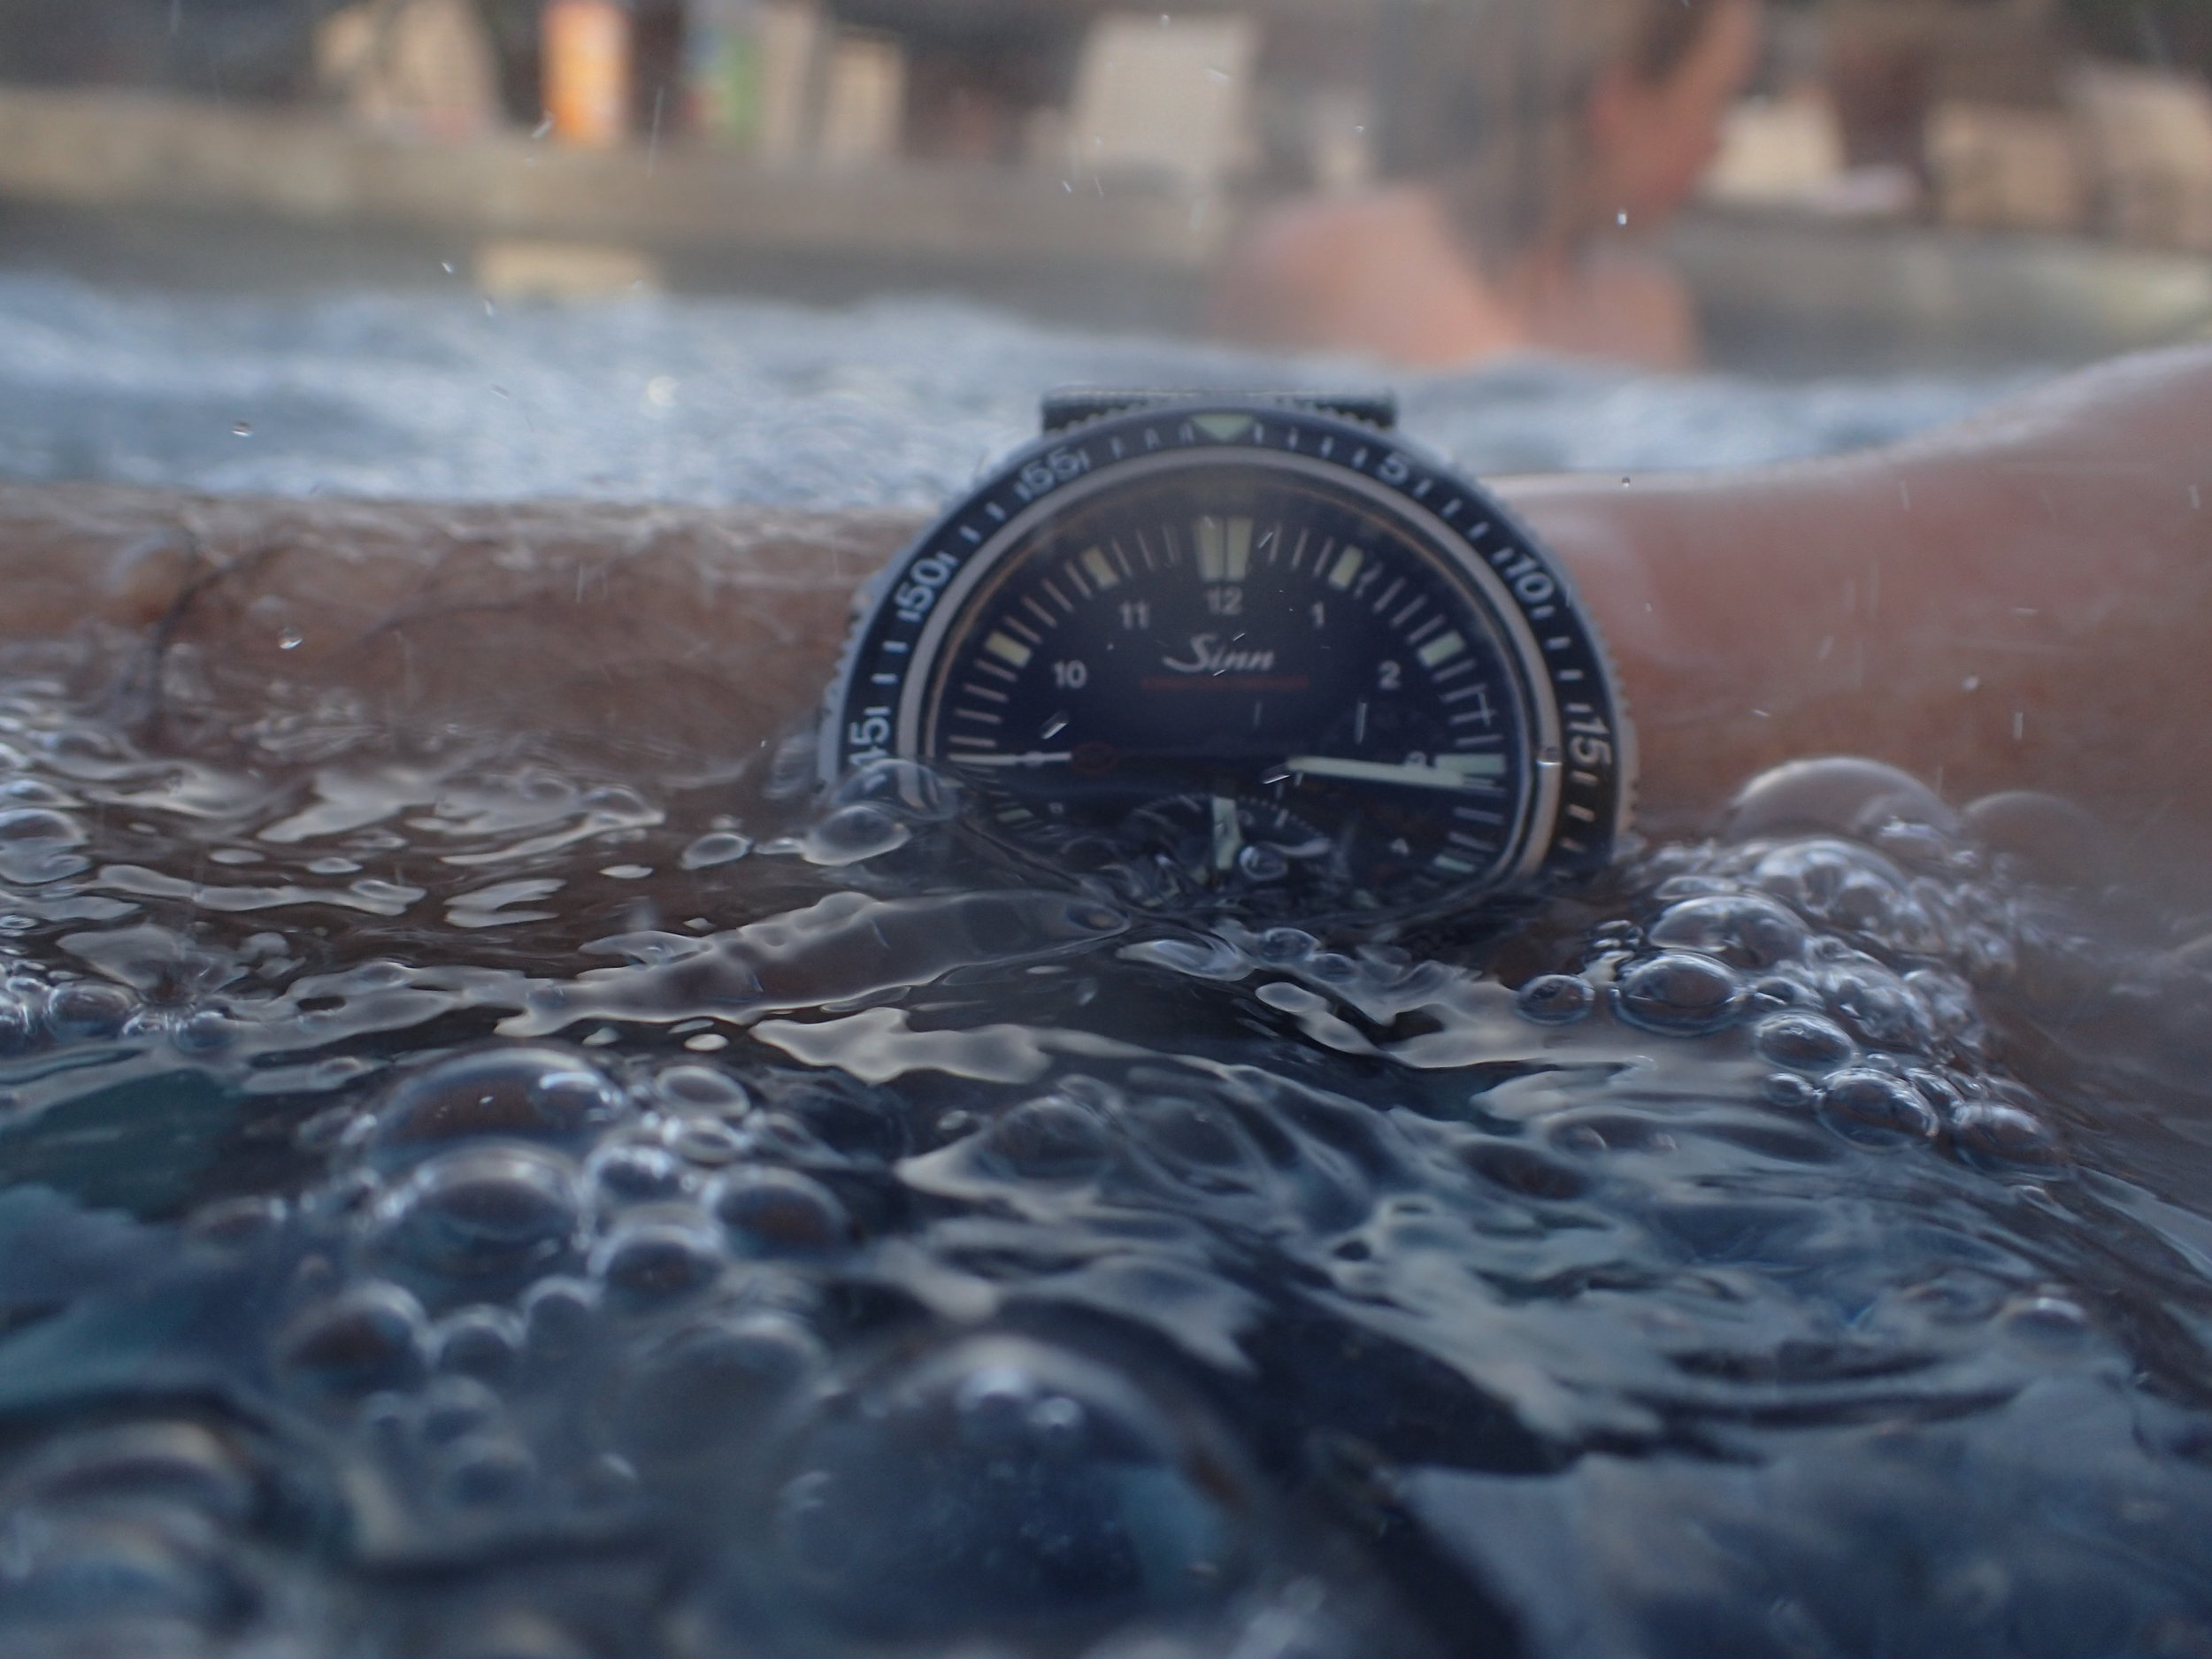 The Sinn EZM 13 has an impressive water resistance of 500 m.